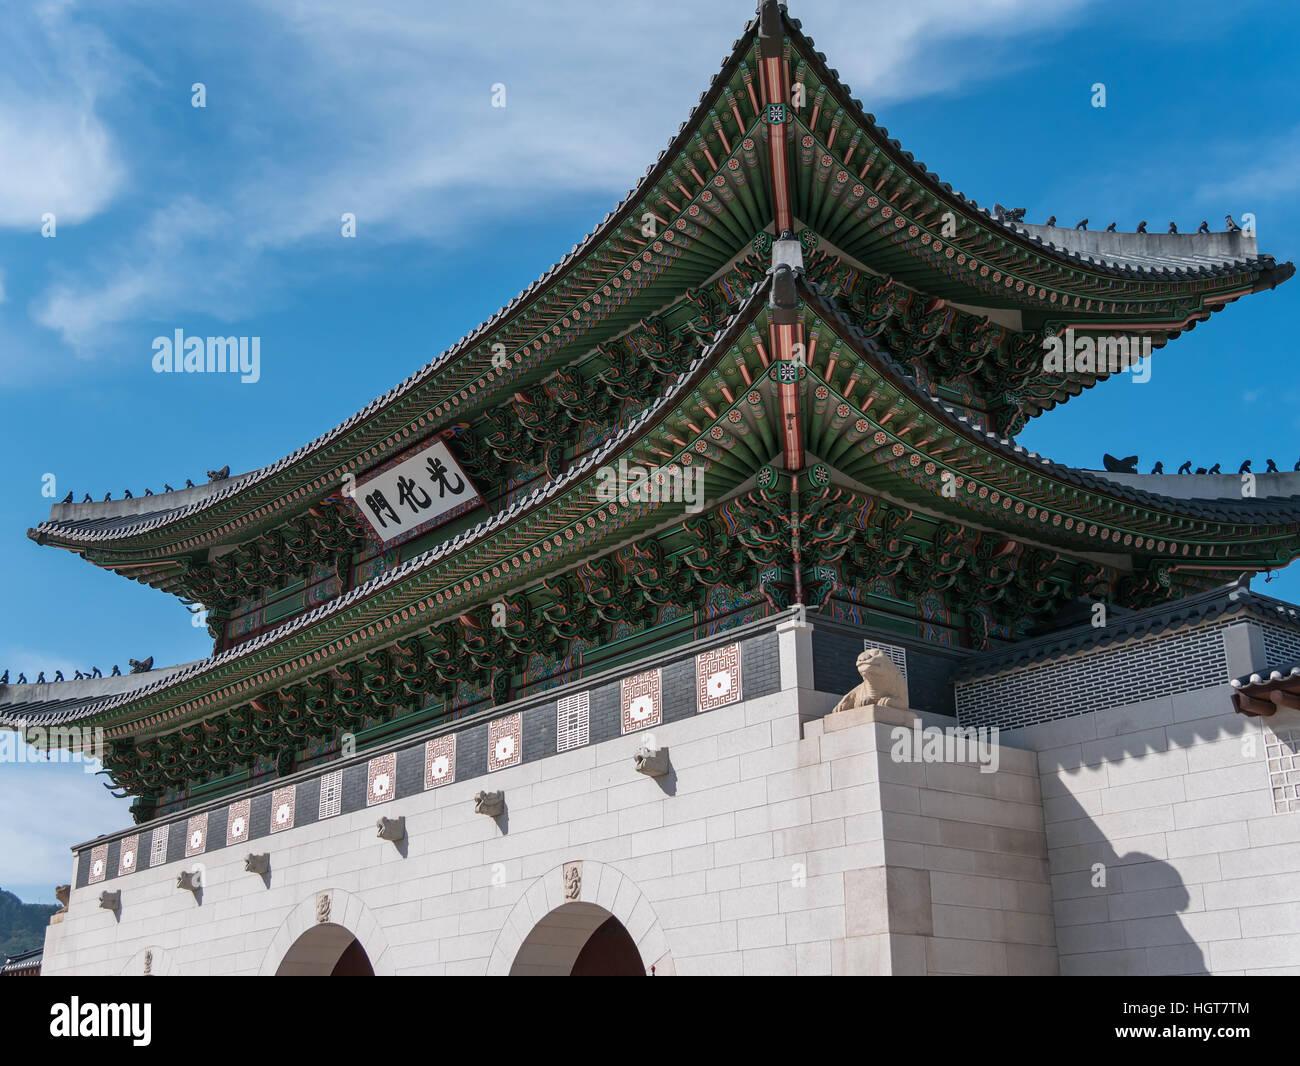 Gwanghwamun Gate in Seoul, Korea. - Stock Image